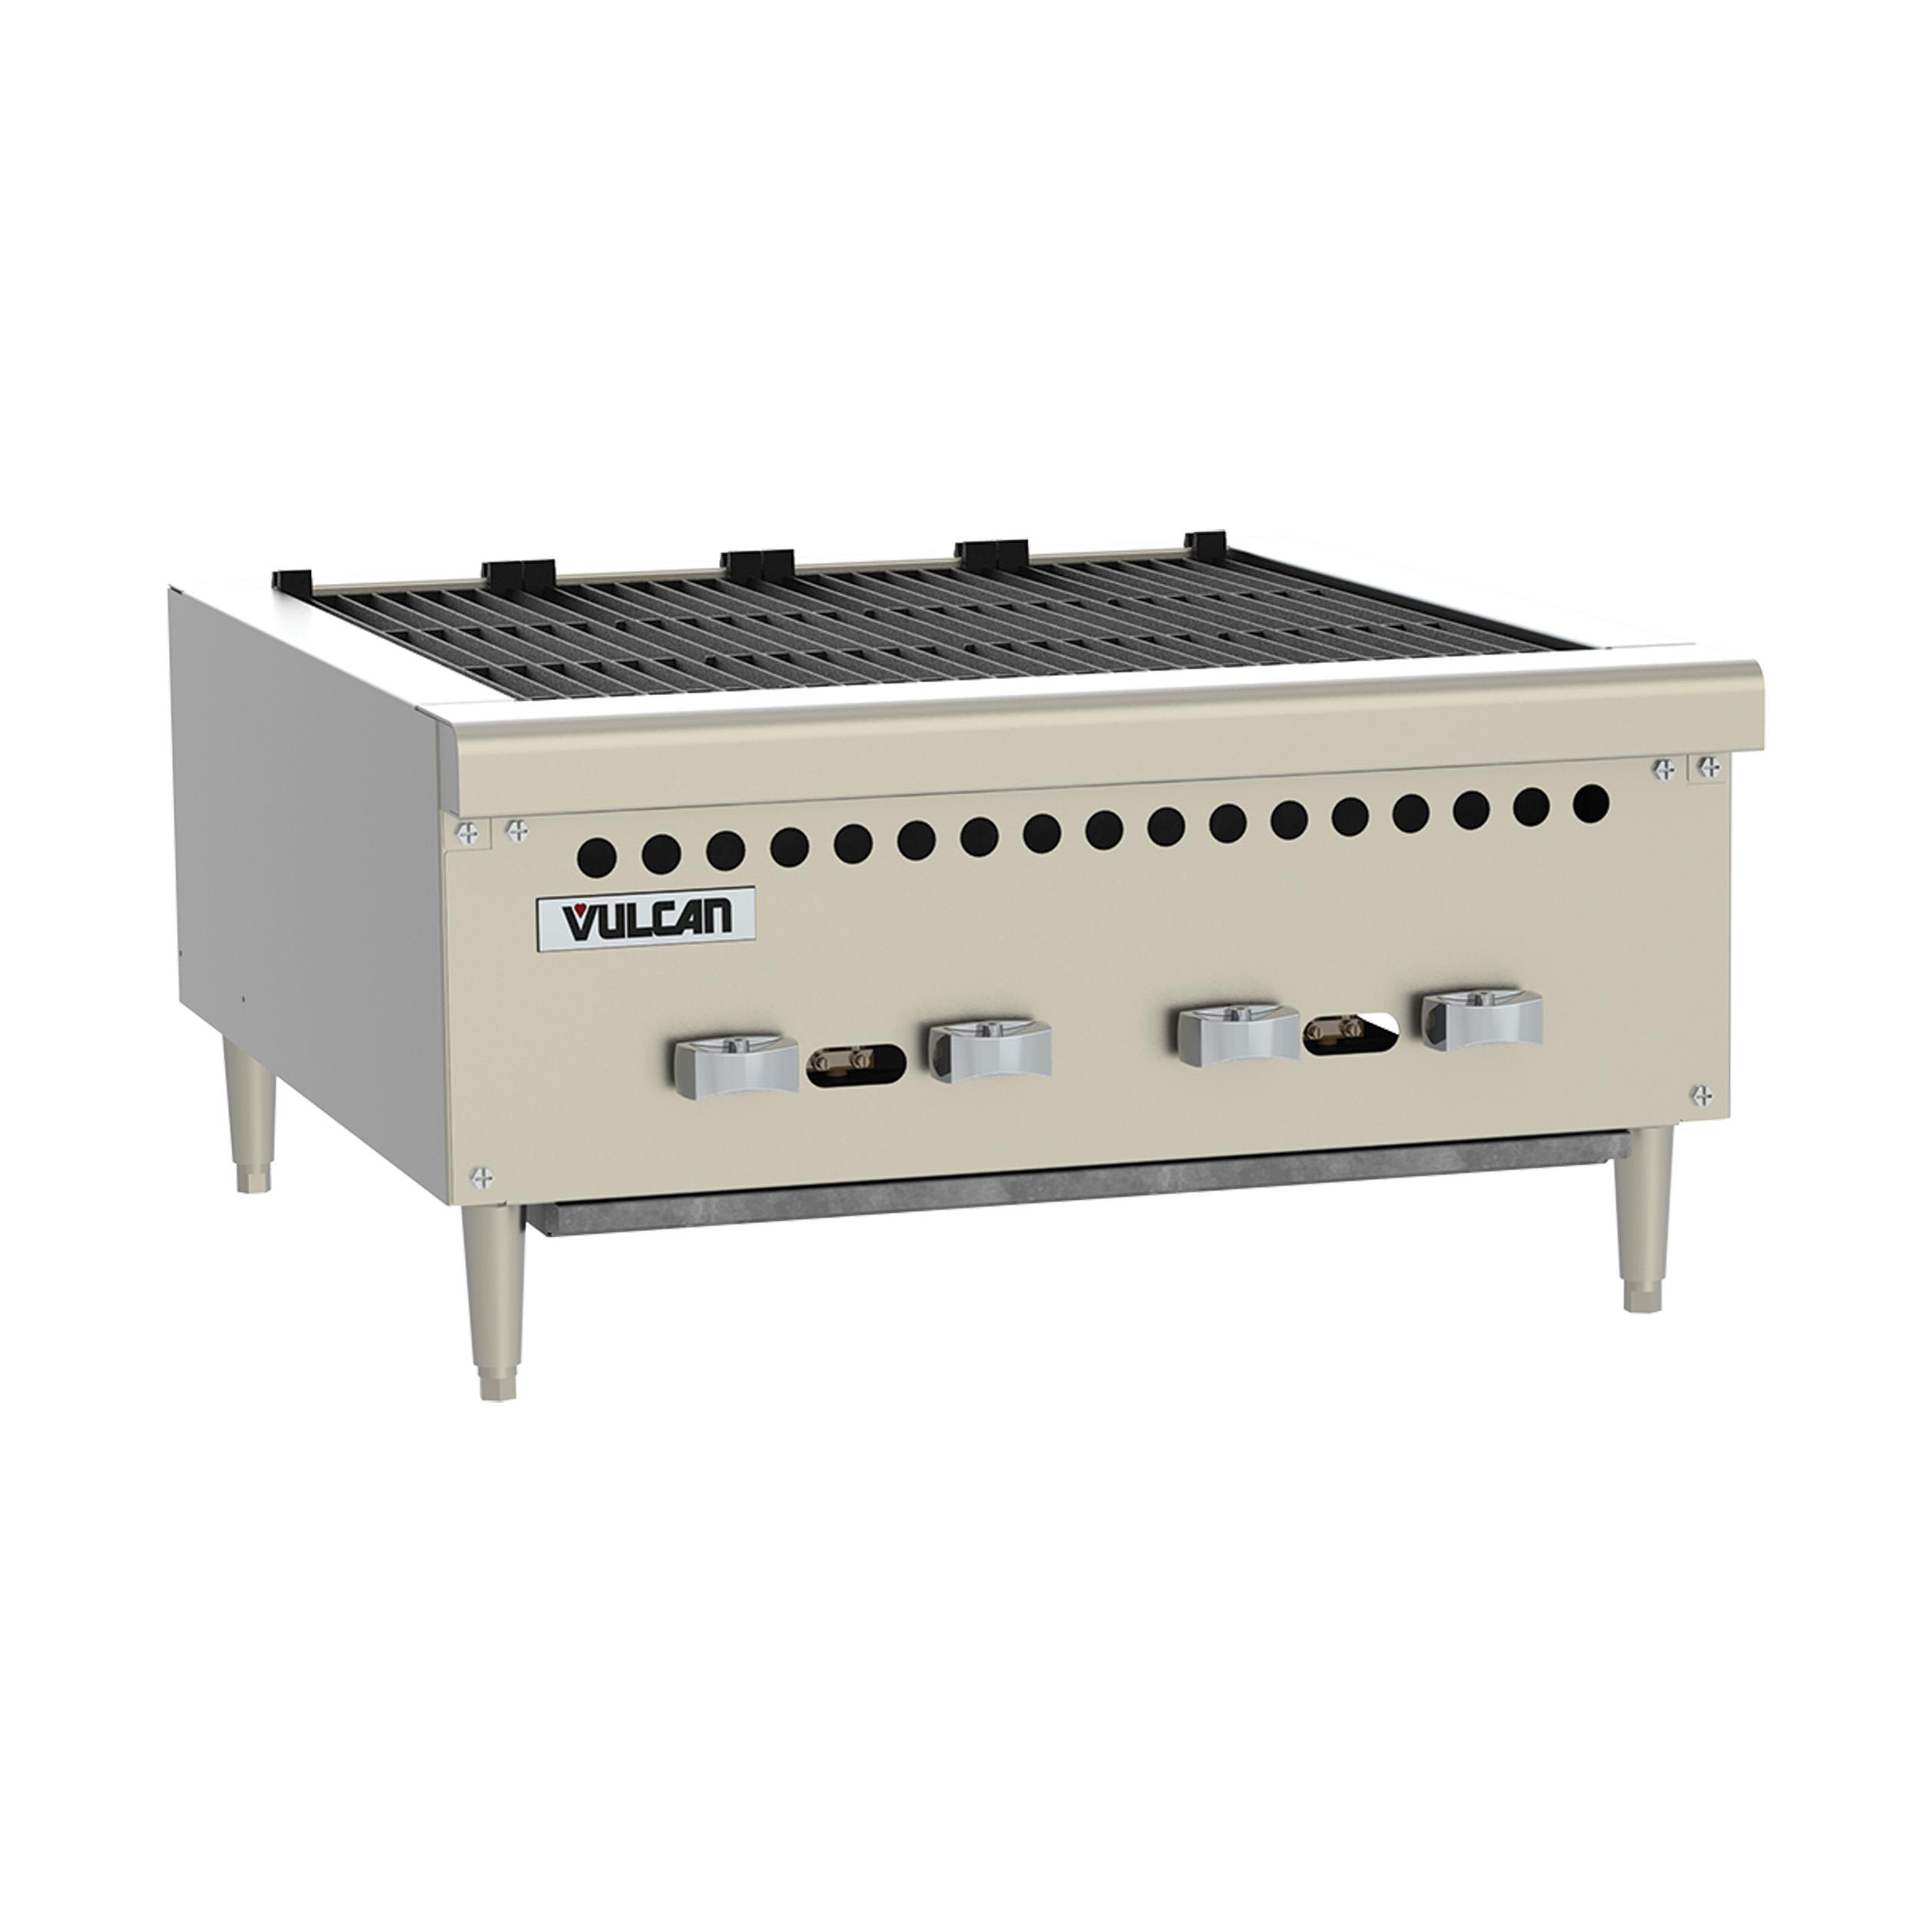 Vulcan VCRB36 charbroiler, gas, countertop